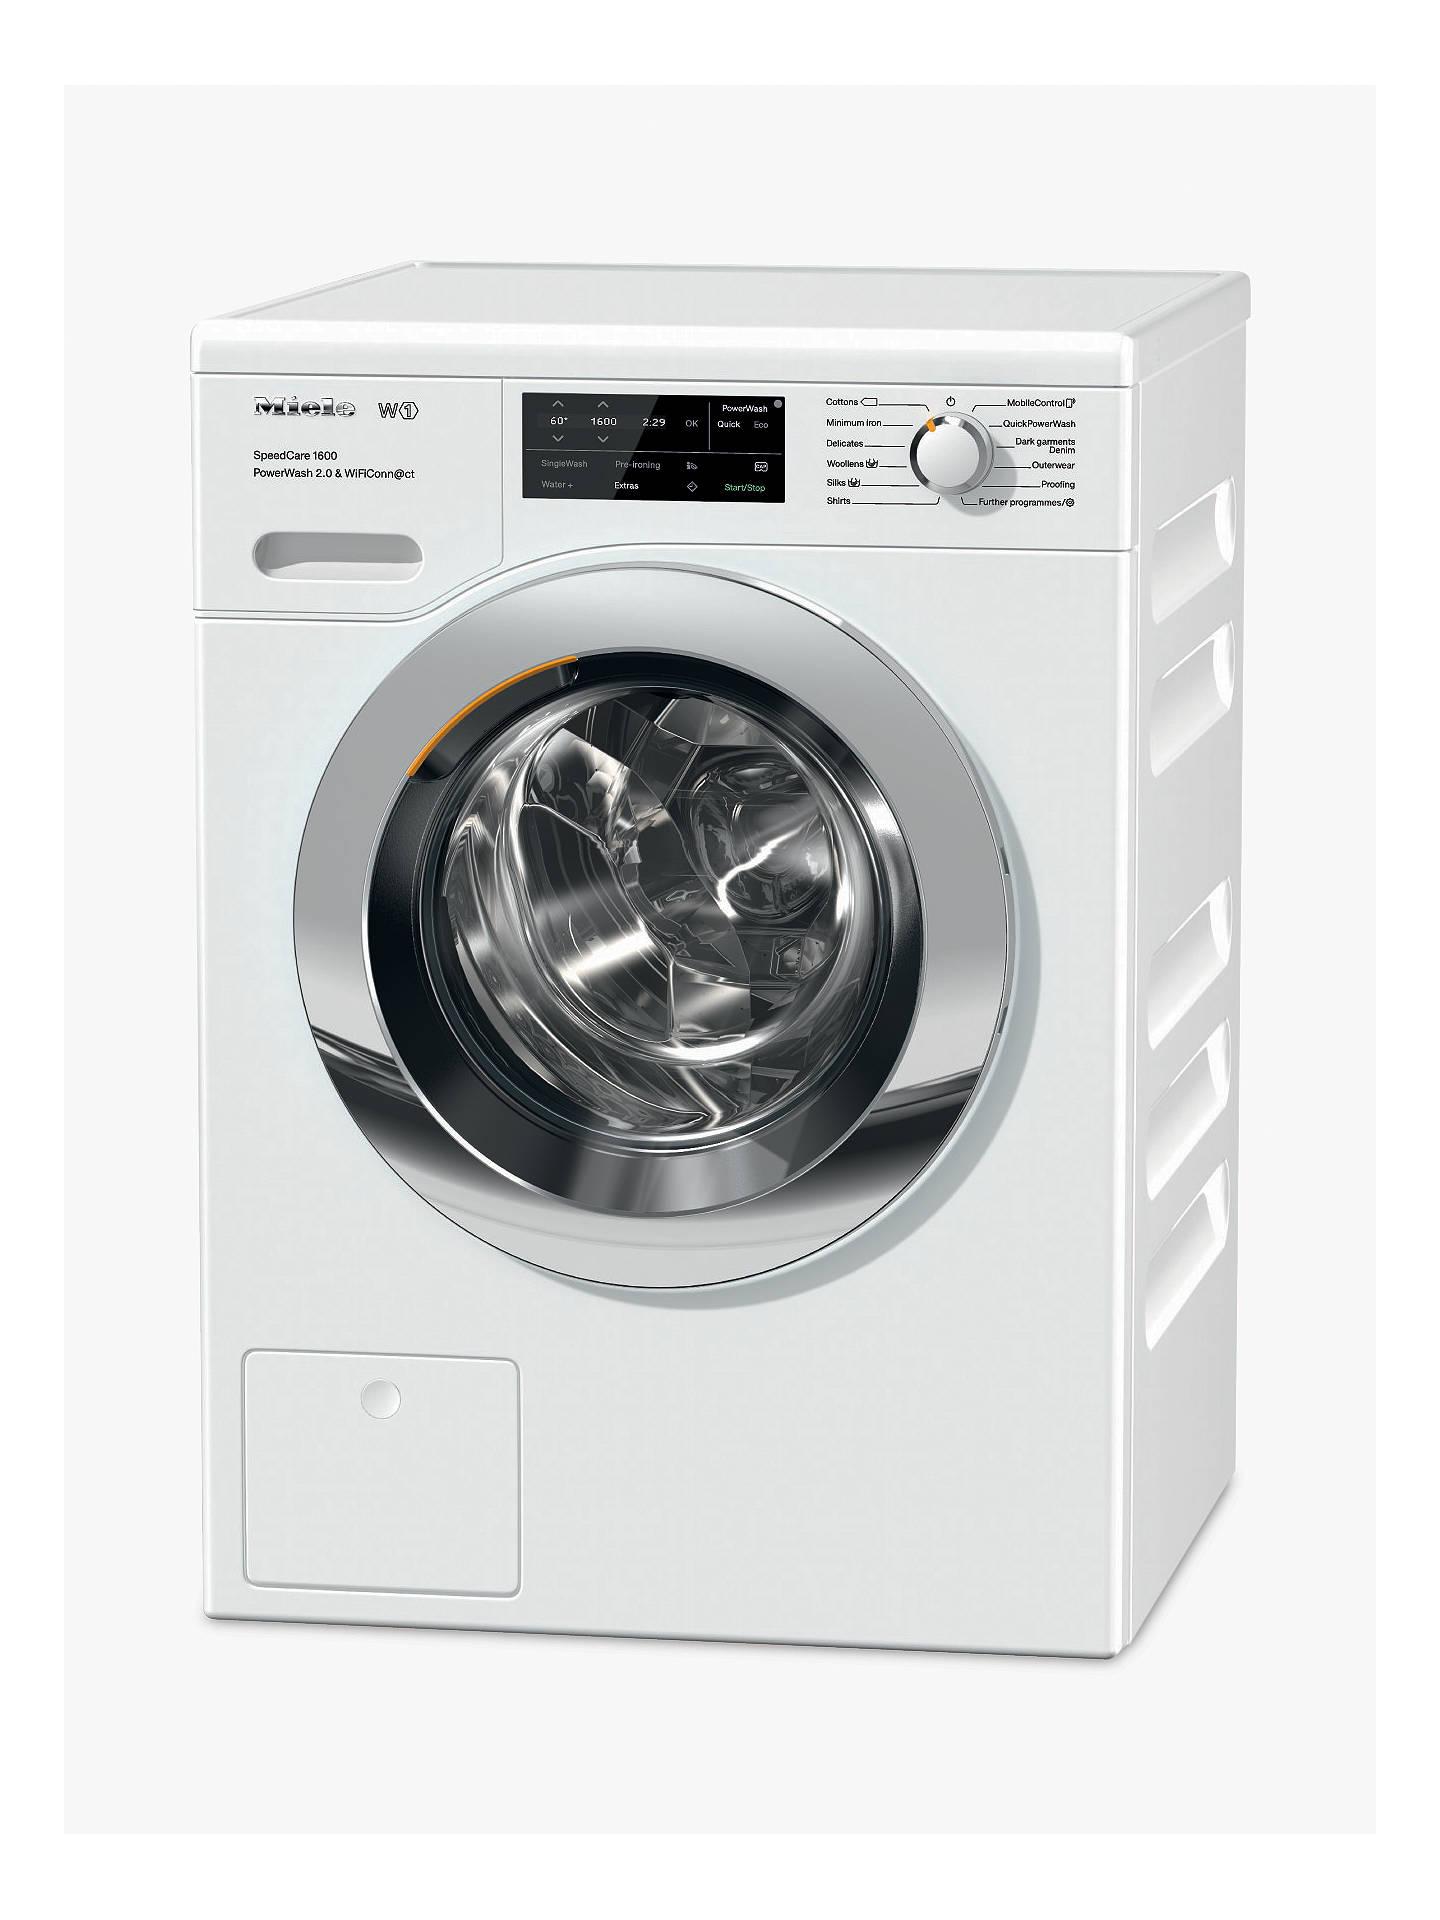 Miele Washing Machine >> Miele Wch360 Washing Machine A Energy Rating 8kg 1600rpm